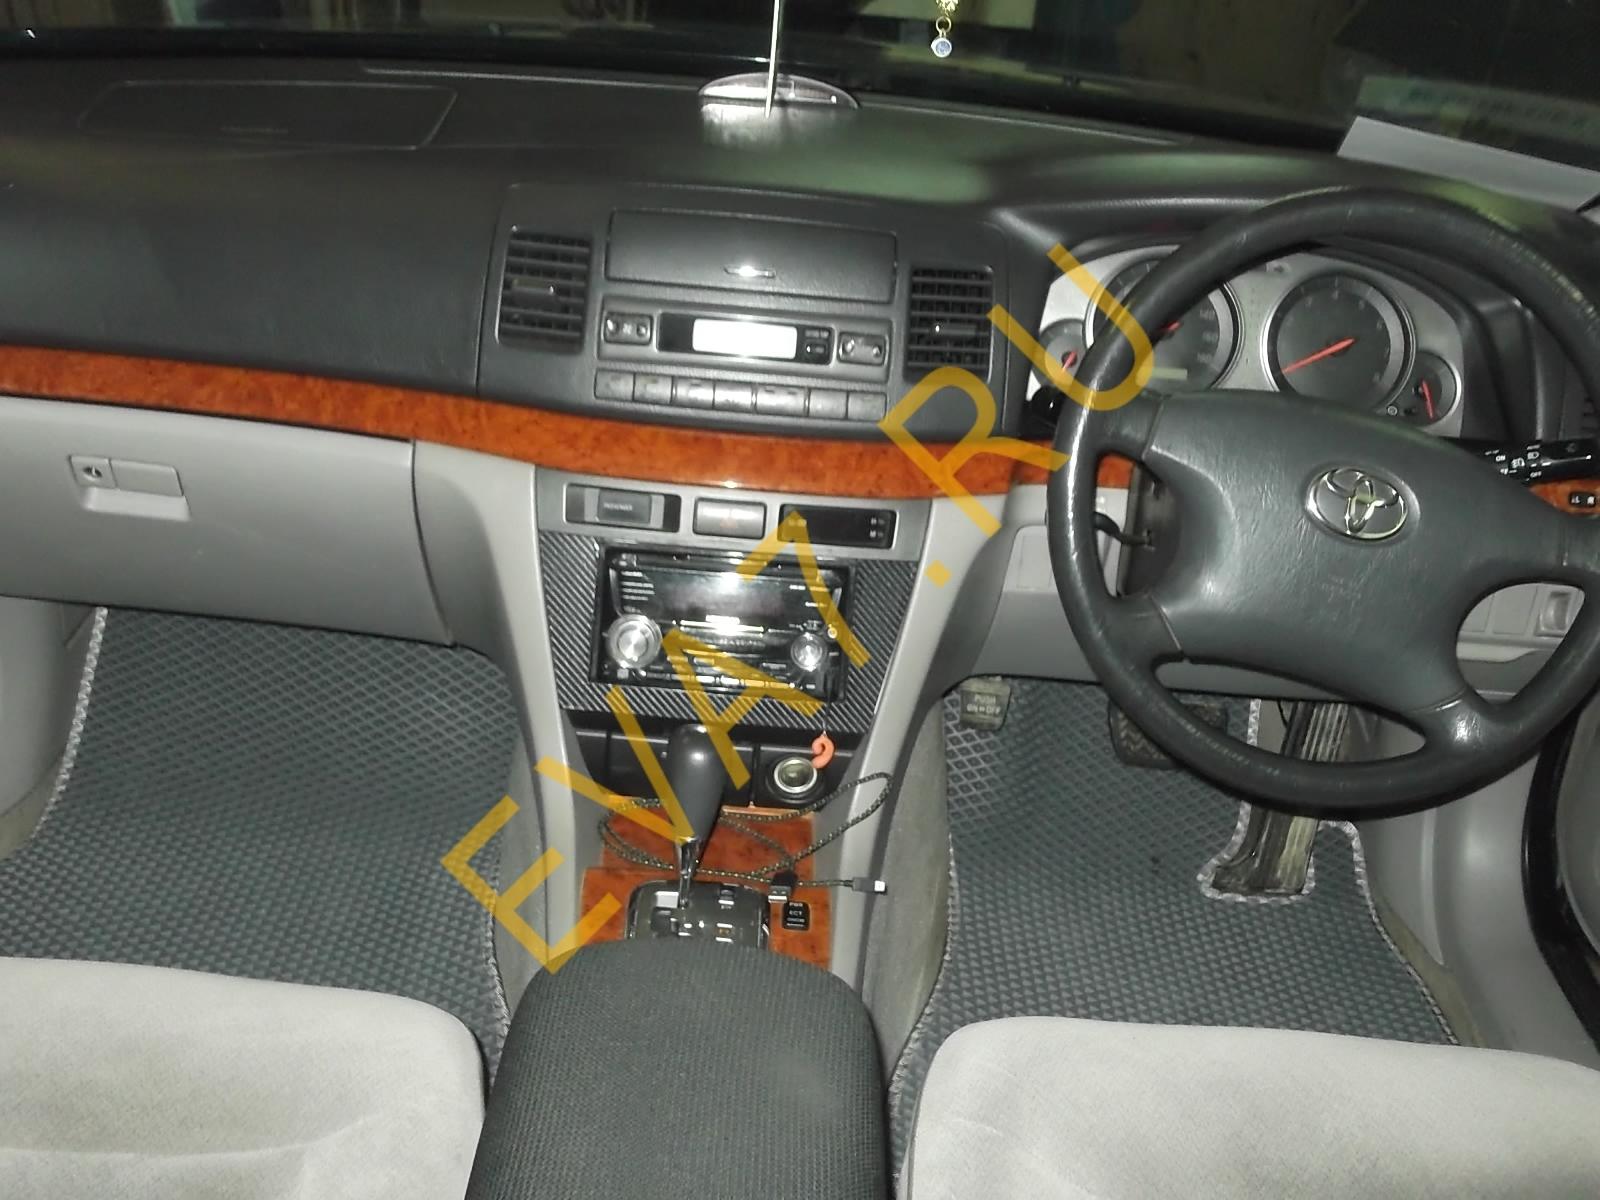 Коврики в салон Toyota Mark II (X110) правый руль 2000-2007